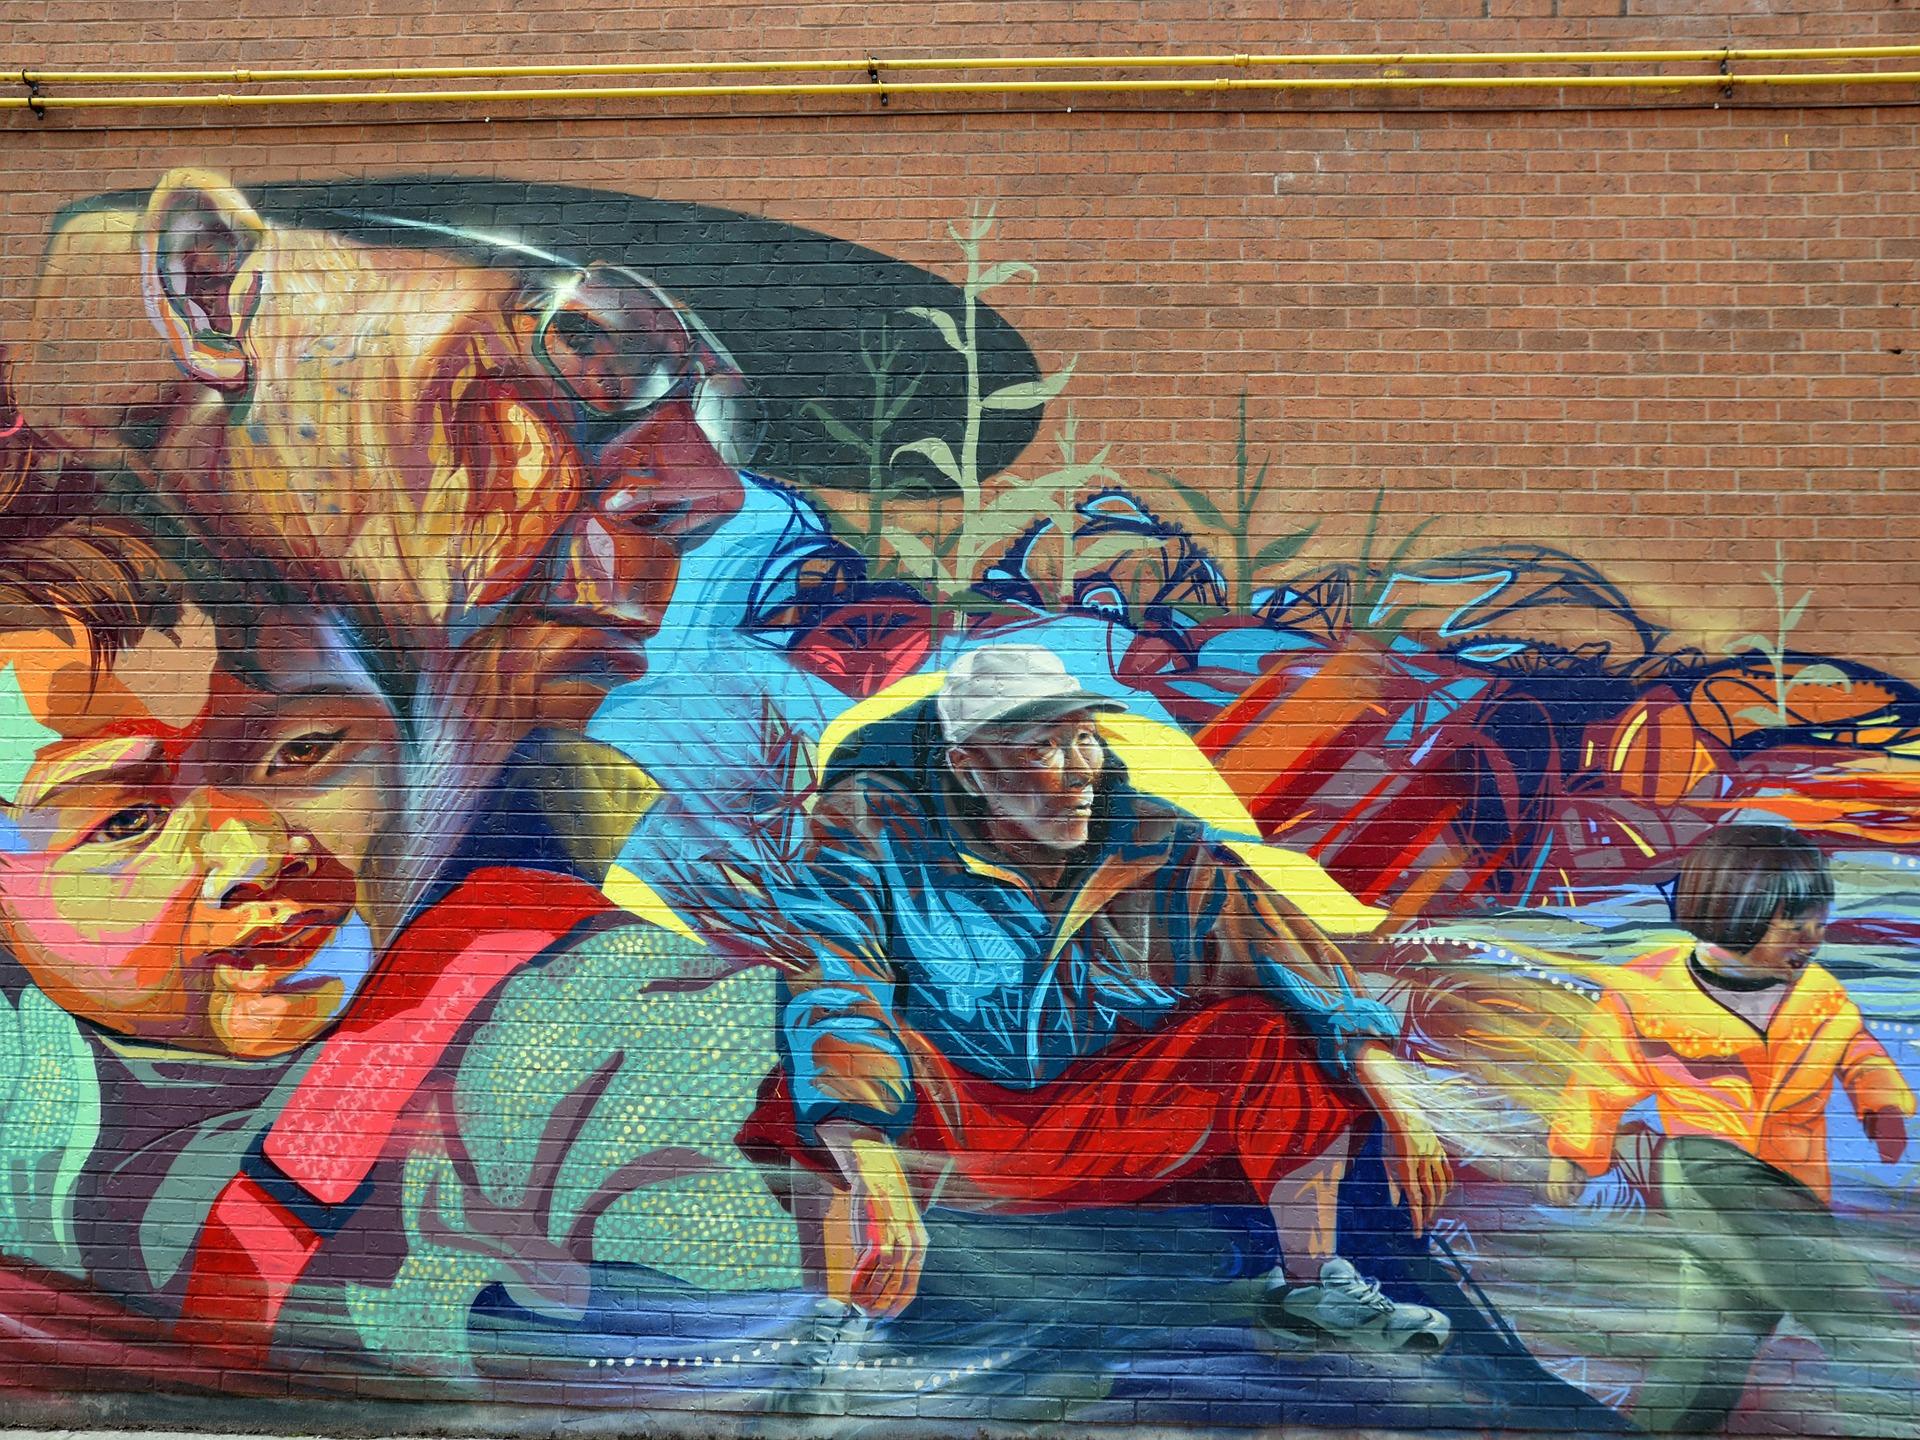 Toronto is well known for its Street Art © Jonas Jovaisis